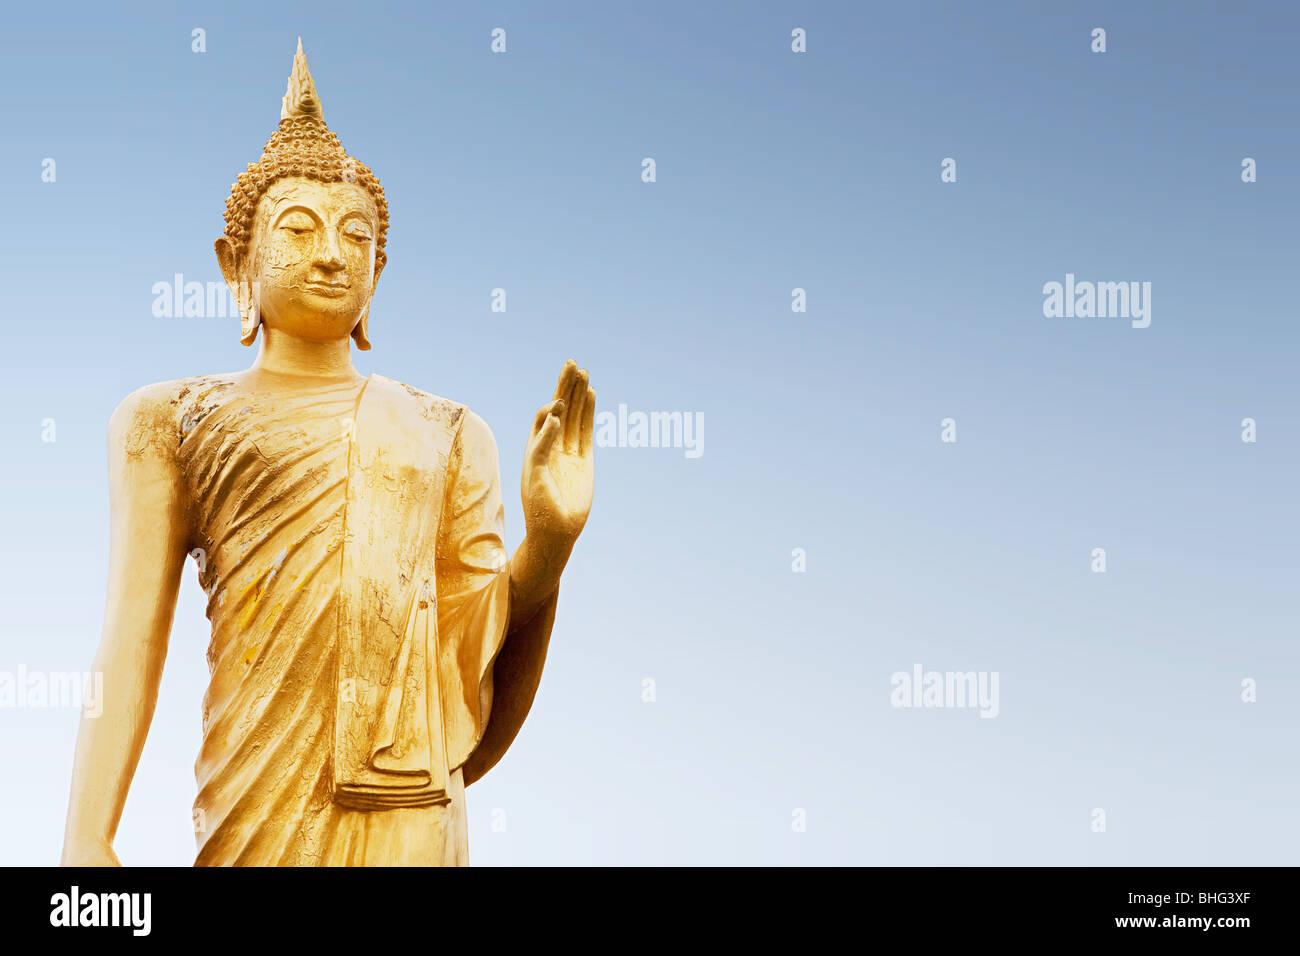 Standing buddha figure in thailand - Stock Image